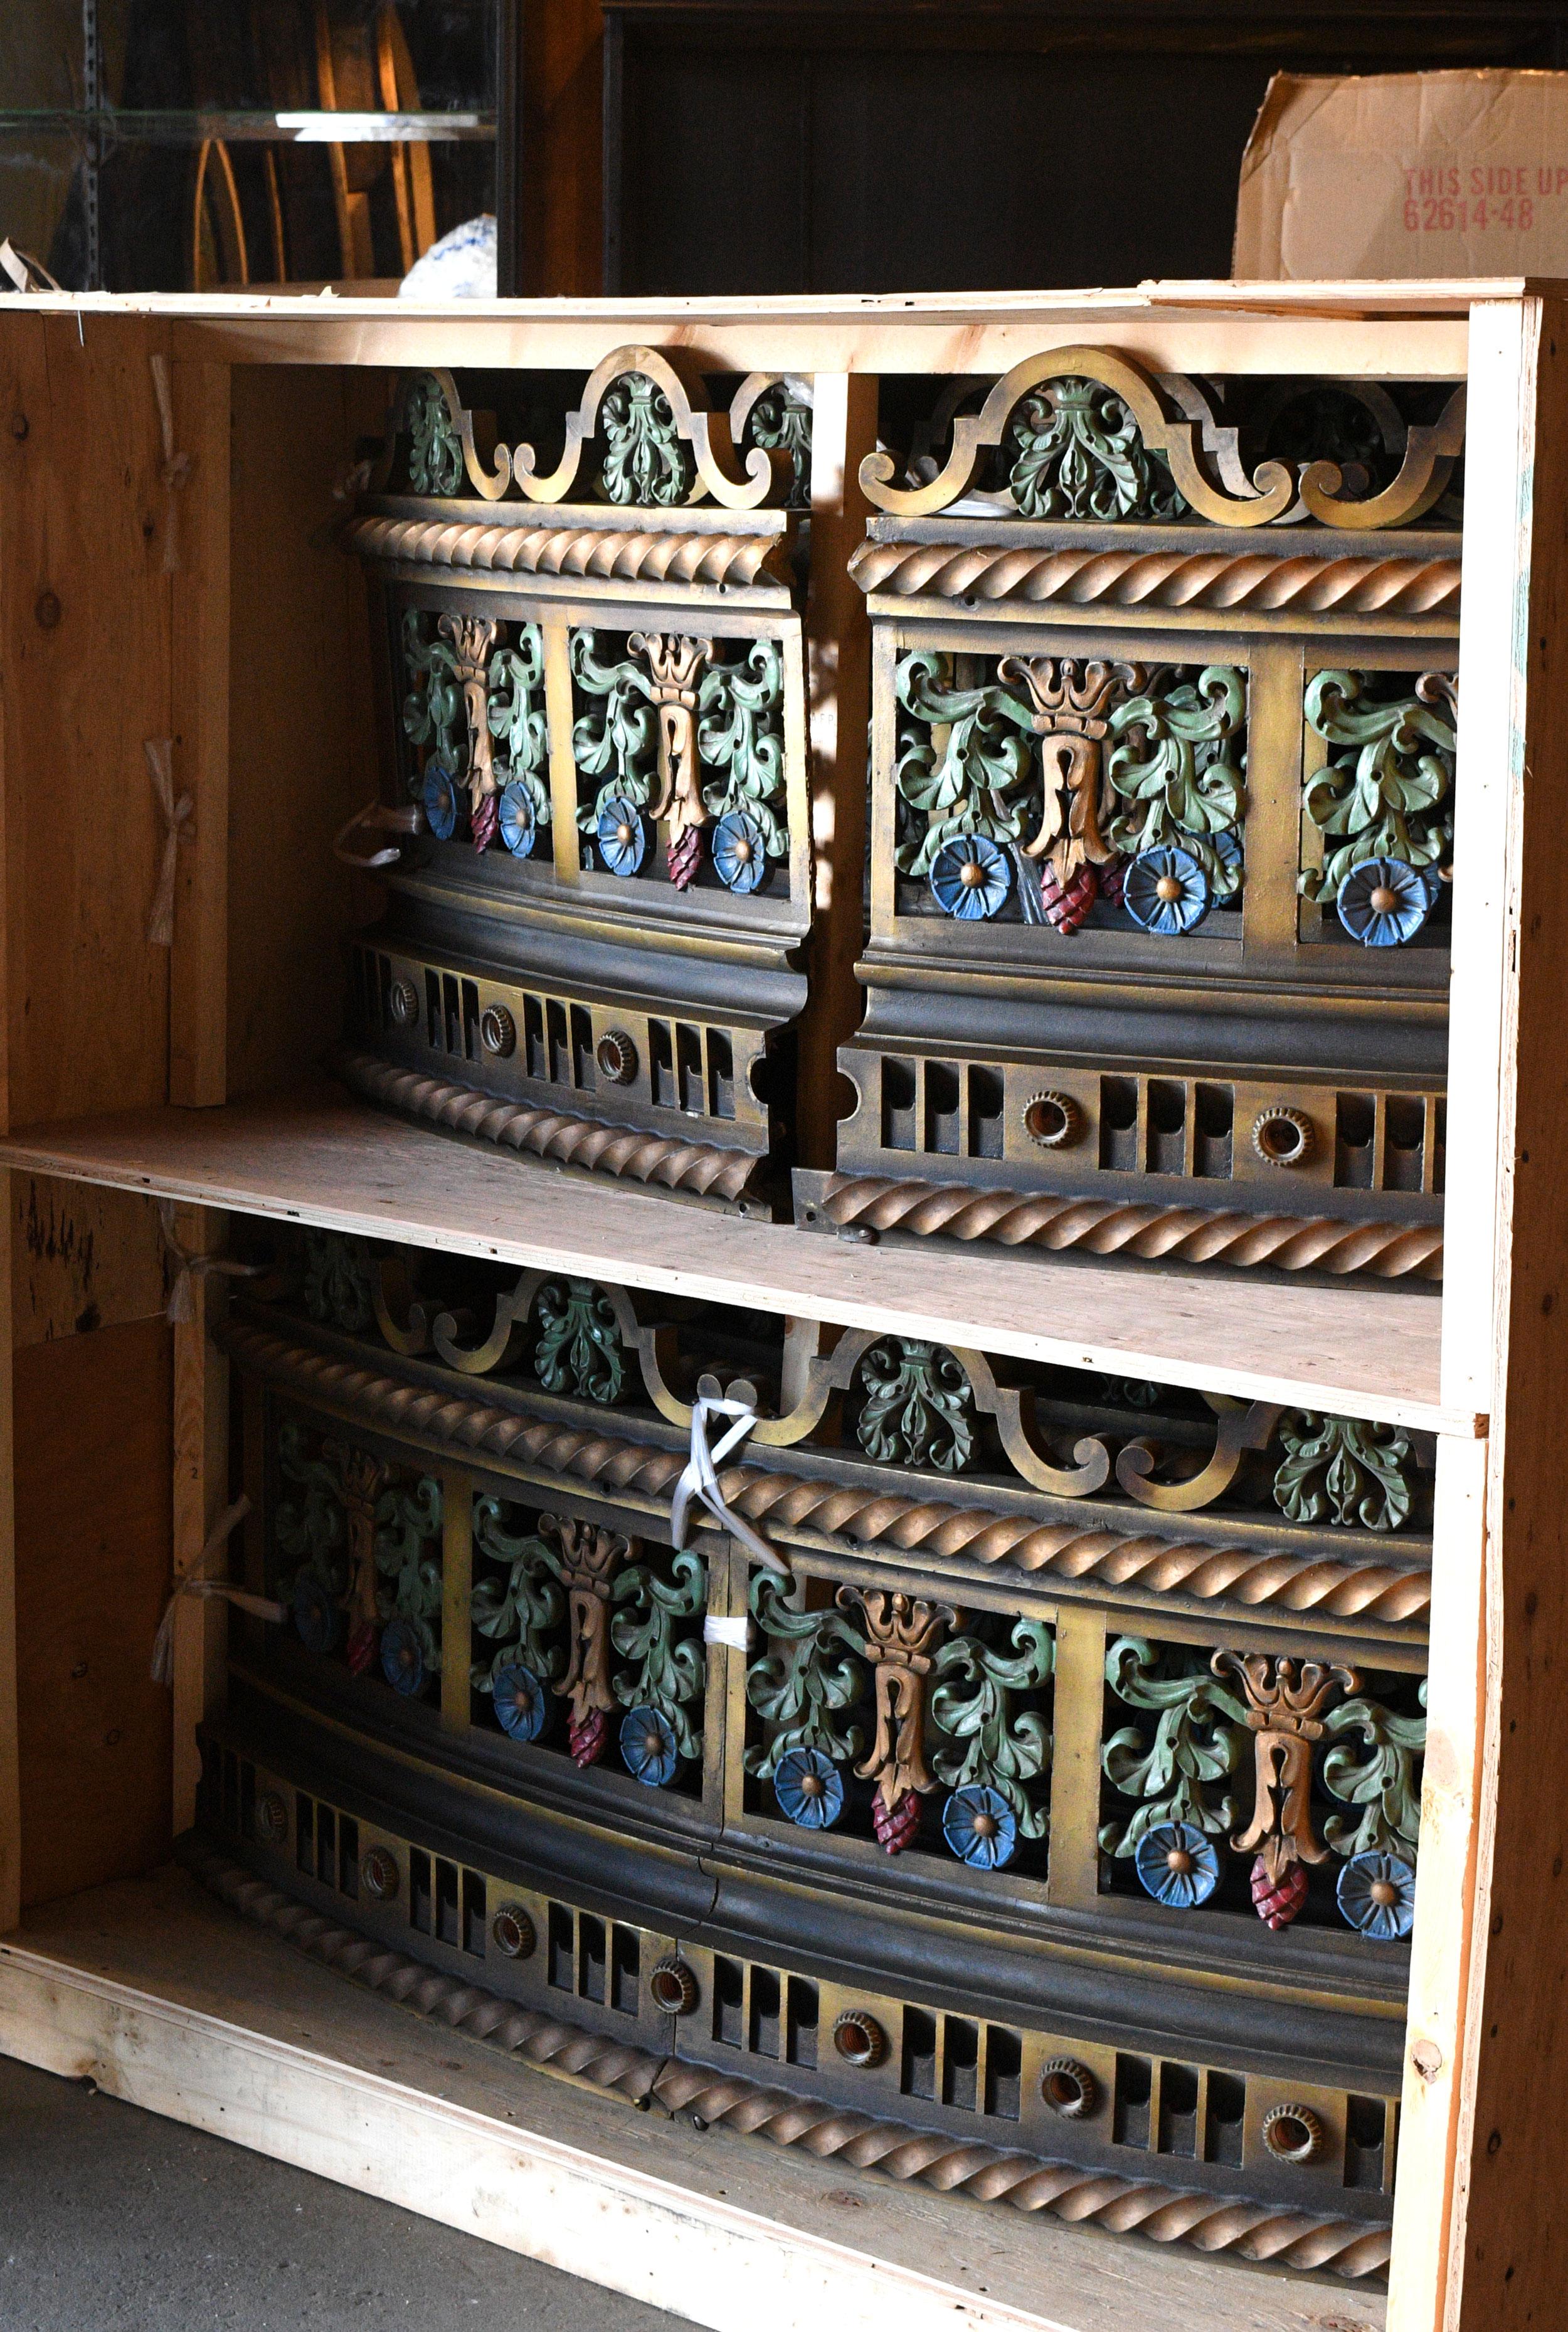 47783-massive-12-ft-chandelier-panel-crate-angle.jpg